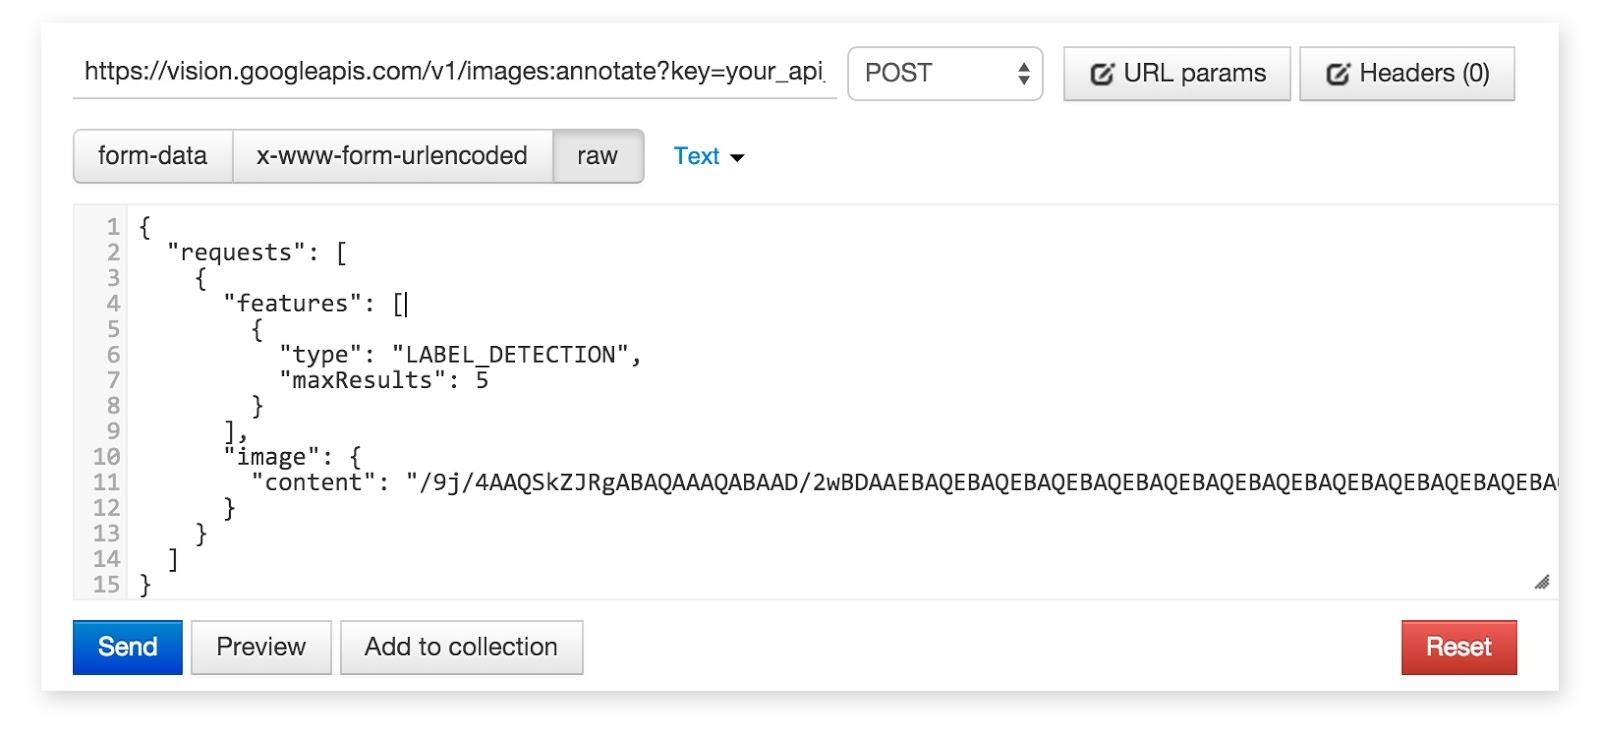 Android Code] ทดลองเล่น Cloud Vision API บนแอนดรอยด์